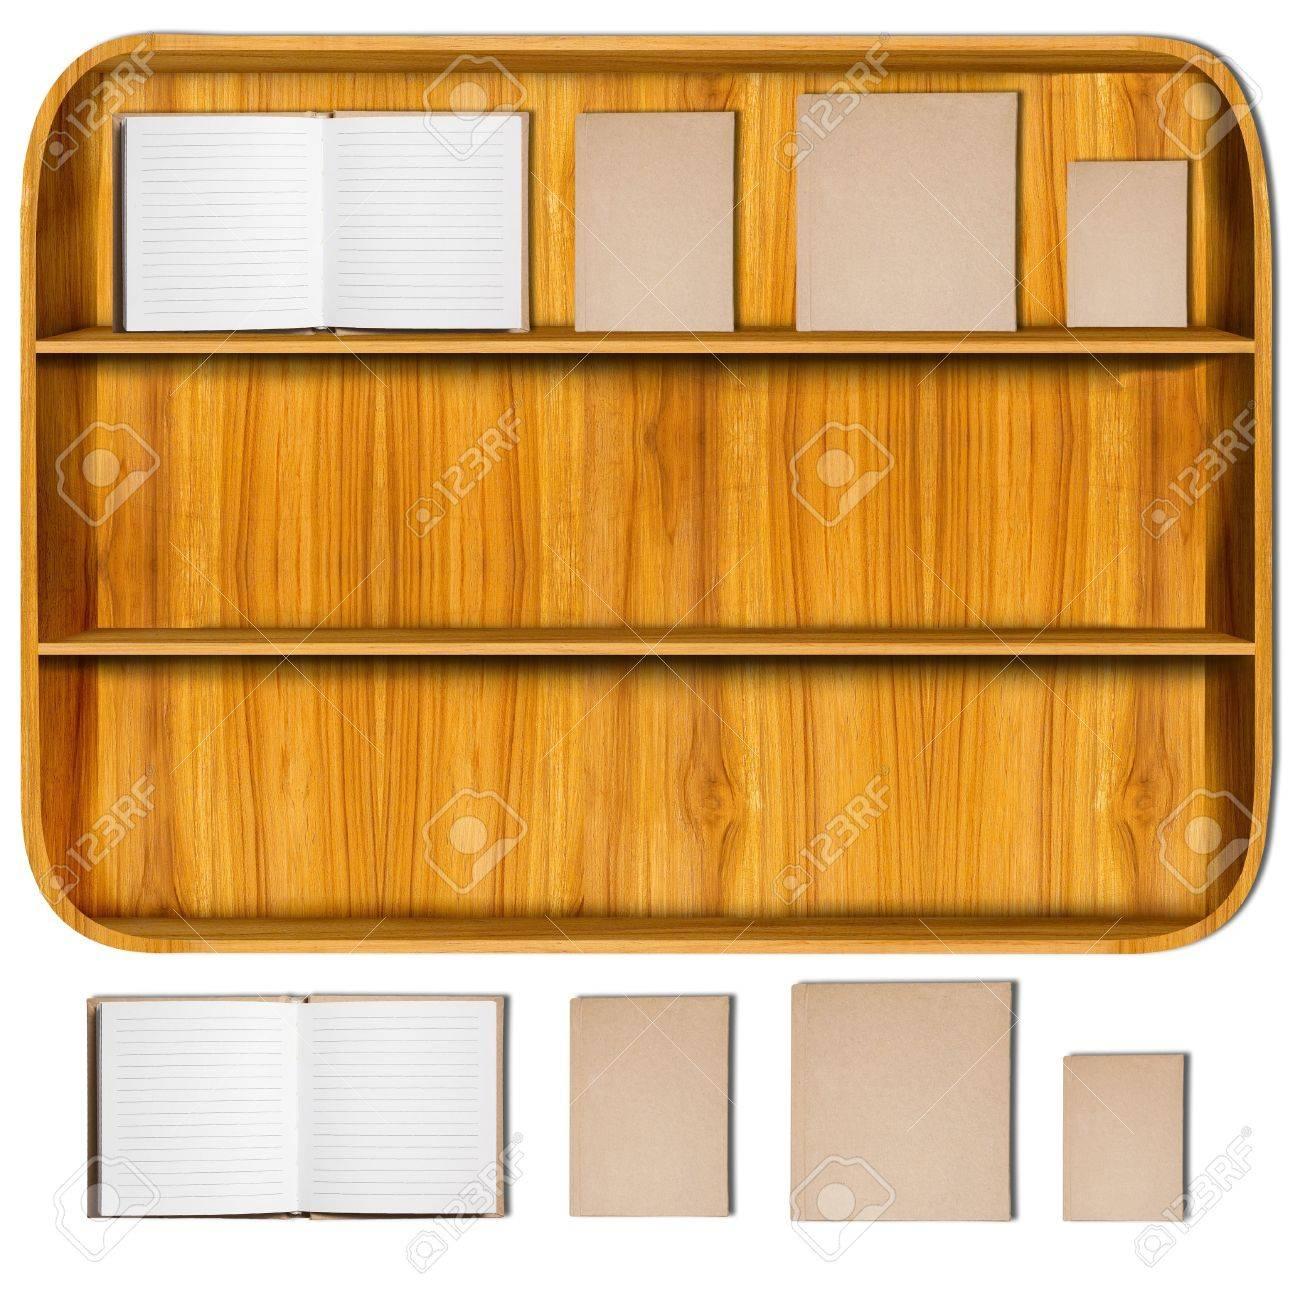 Wooden house shelf Stock Photo - 11832352